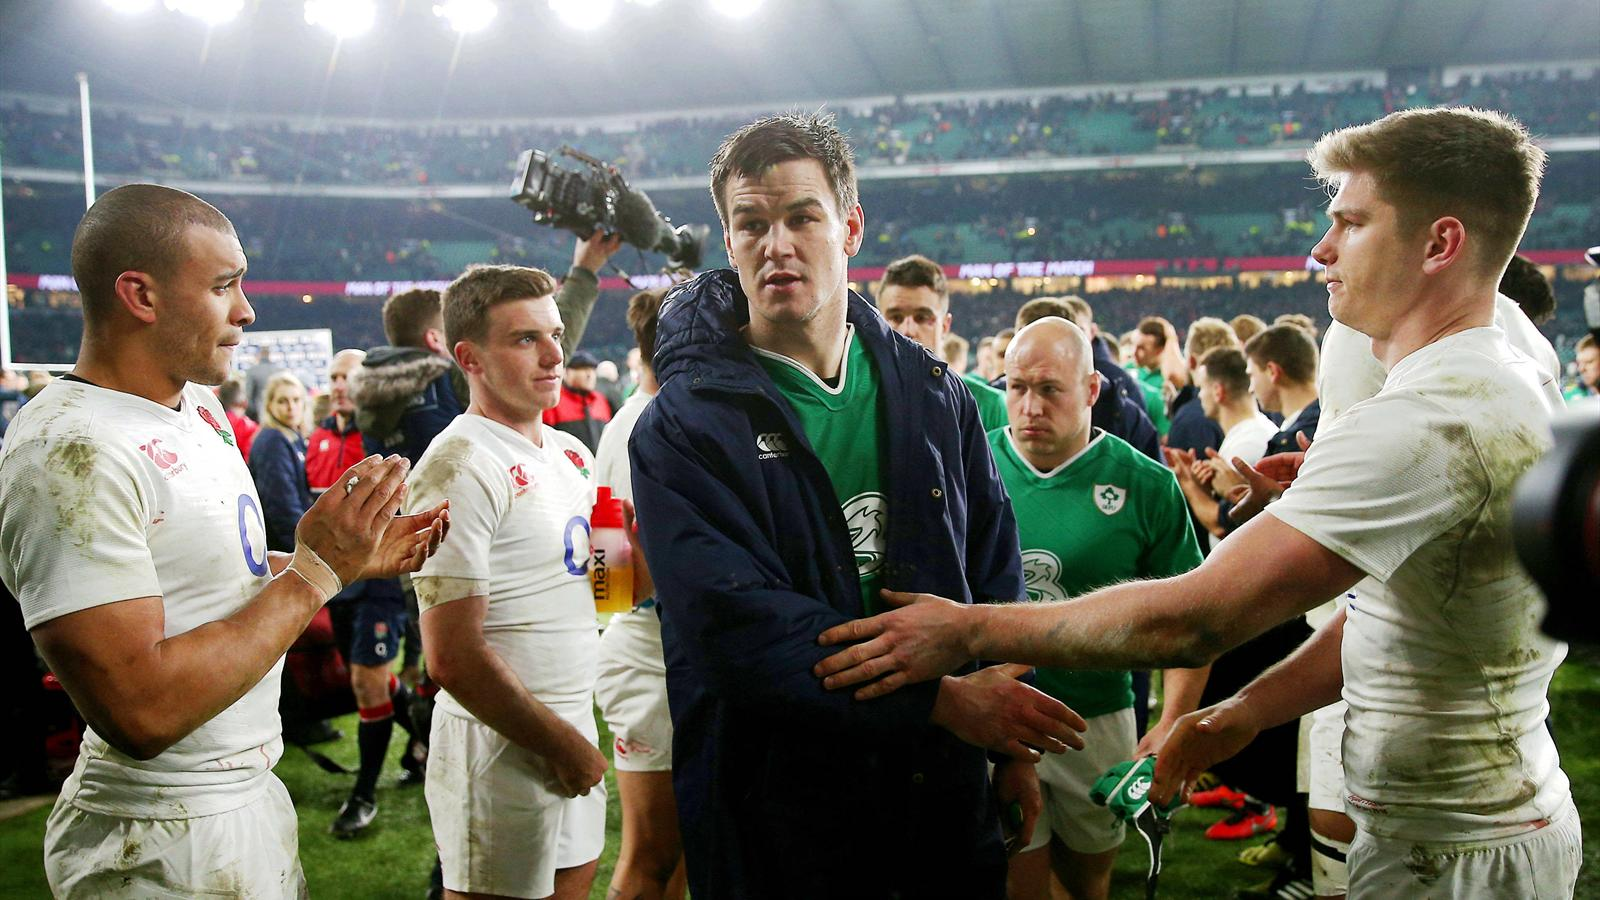 Jonathan Sexton (Irlande) face à l'Angleterre - 27 févrierc 2016